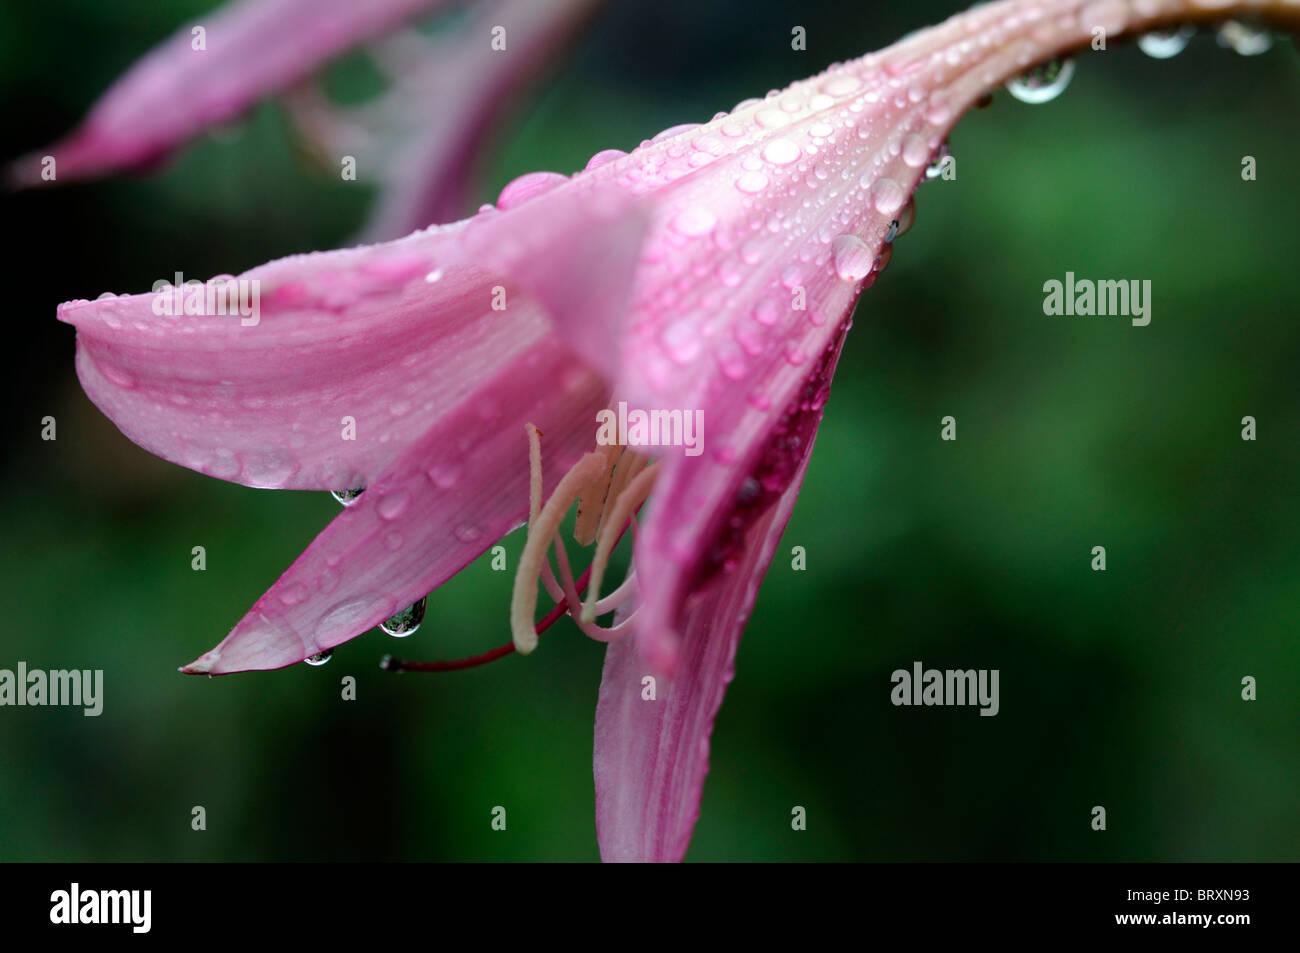 Crinum x powellii Roseum lily flower pink bloom blossom tender late summer bulb perennial Stock Photo